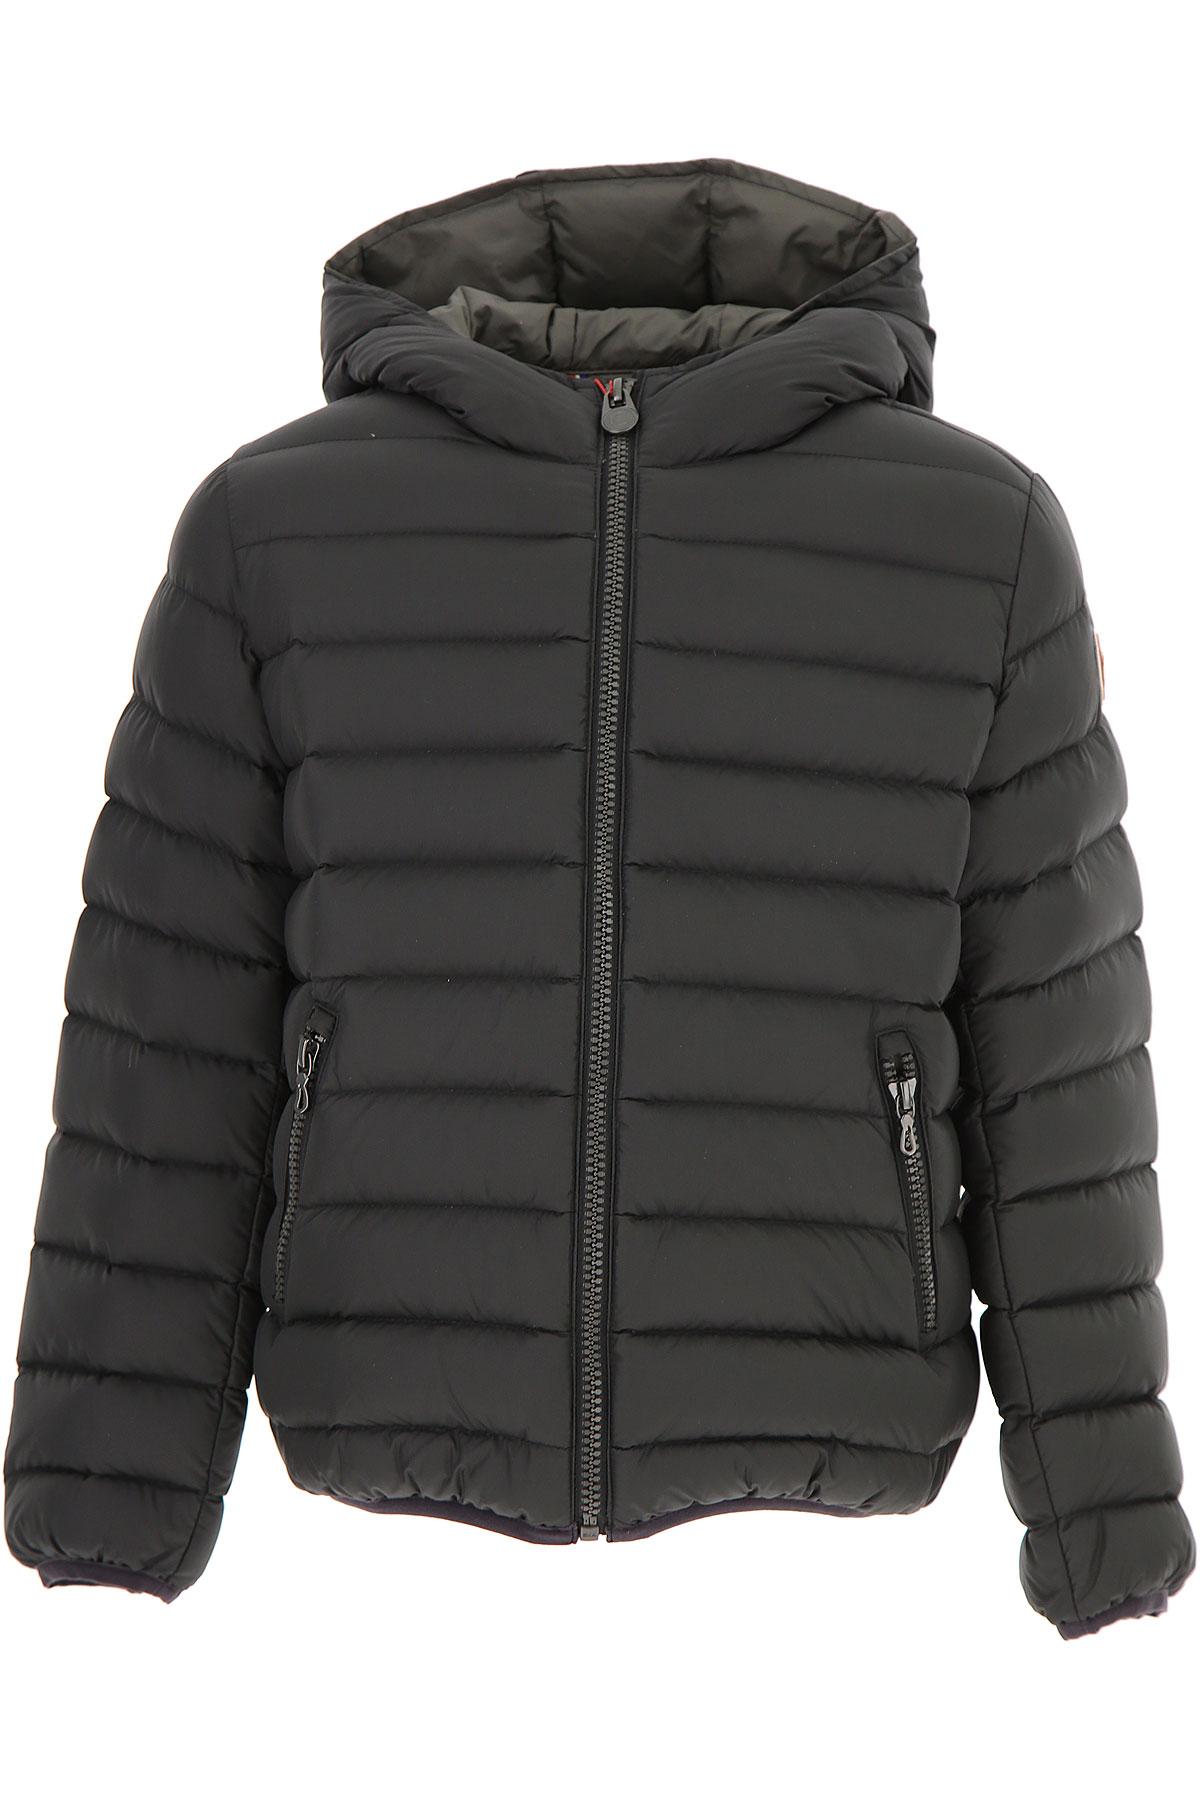 Image of Colmar Boys Down Jacket for Kids, Puffer Ski Jacket, Black, polyamide, 2017, 10Y 14Y 16Y 8Y